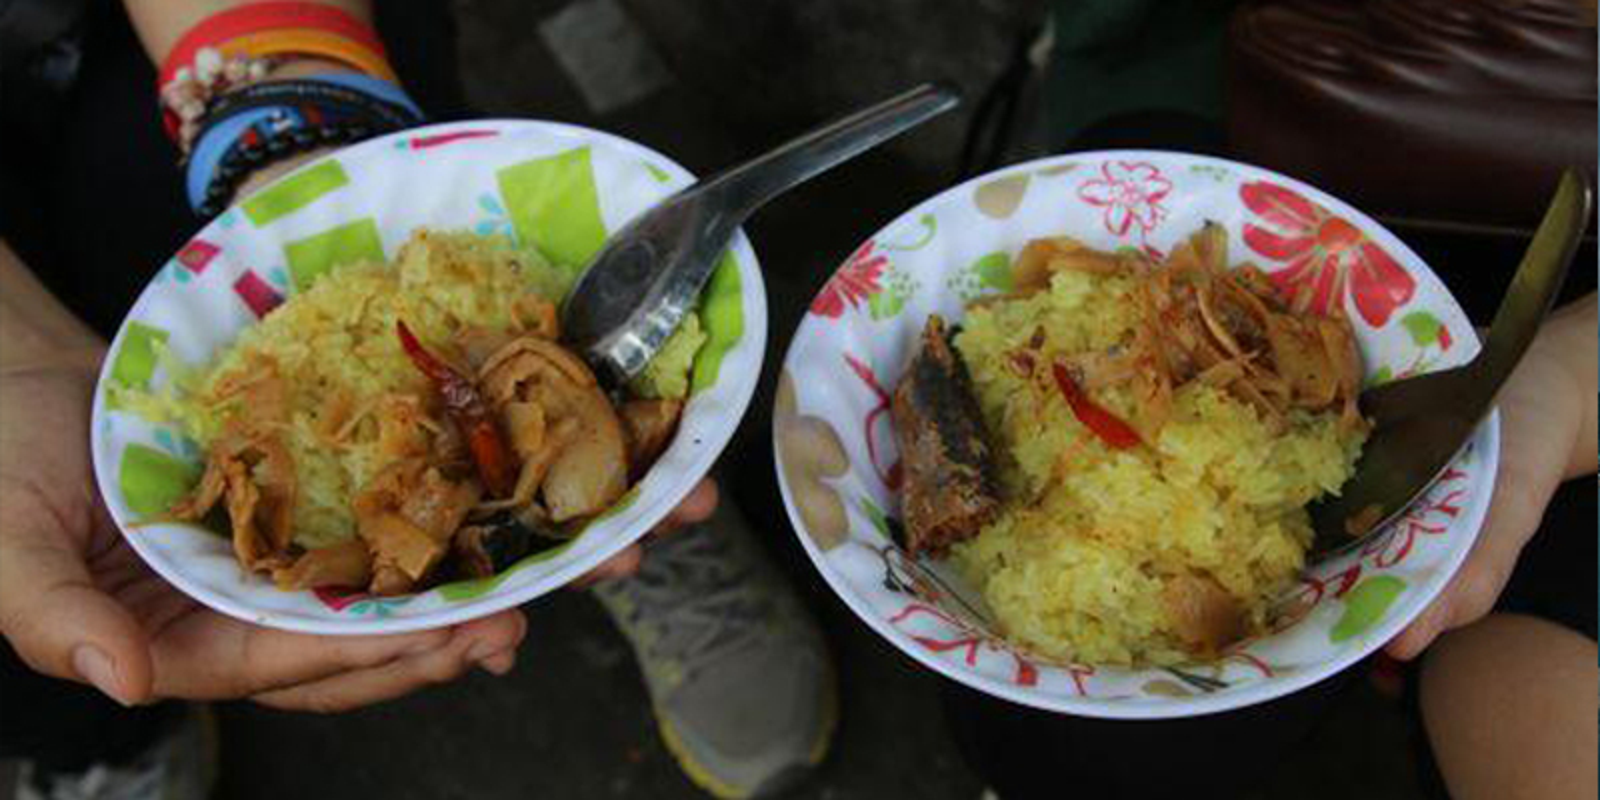 Kham pha mon xoi mang – dac san la mieng cua Kon Tum-Hinh-9